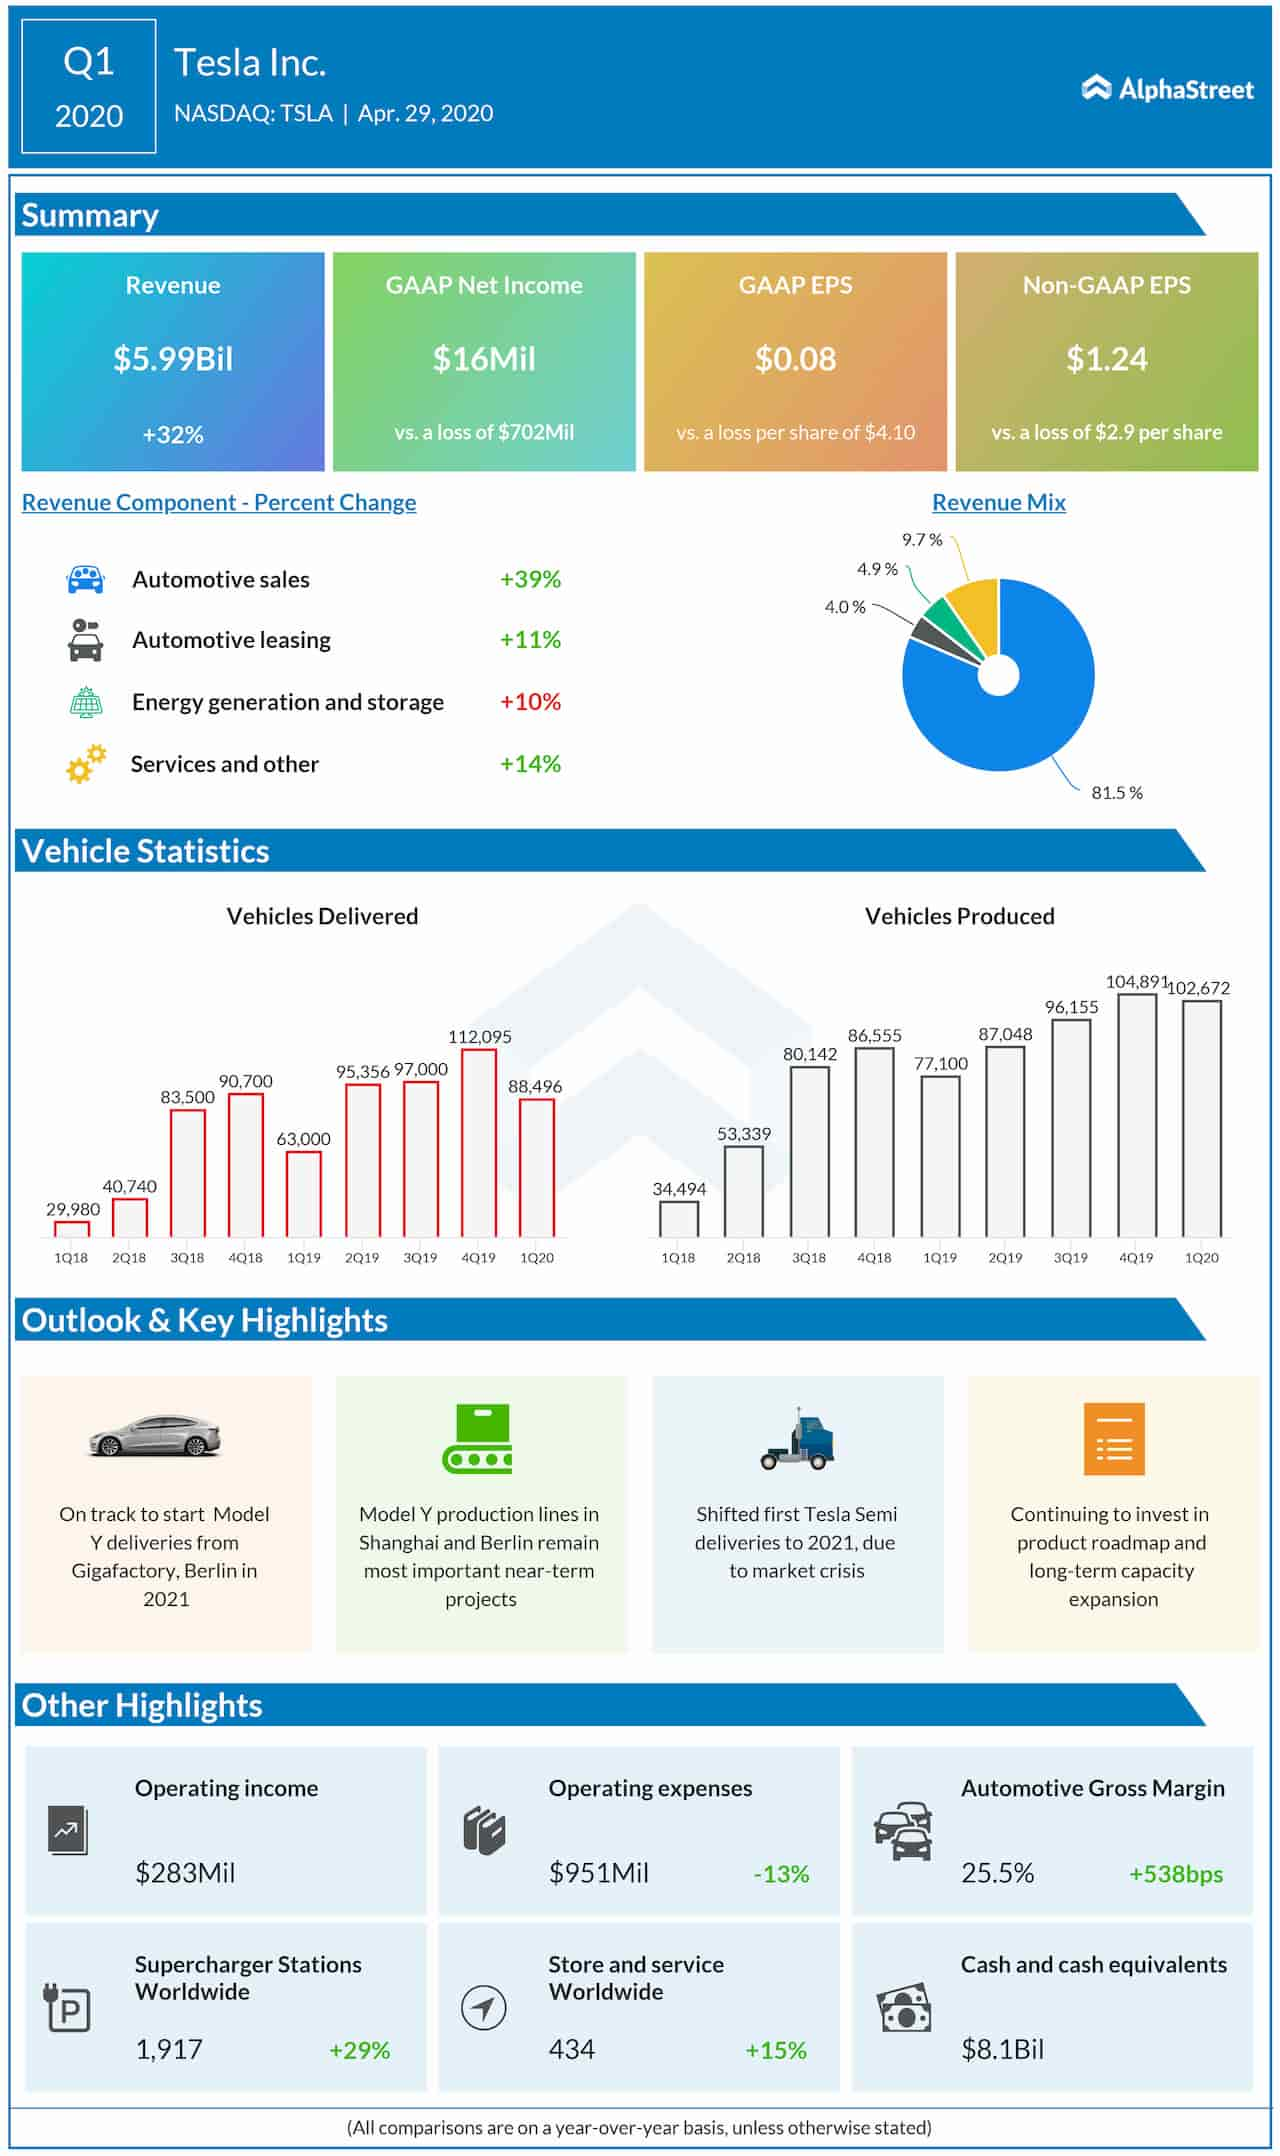 Tesla Inc. (NASDAQ TSLA) Q1 2020 earnings results